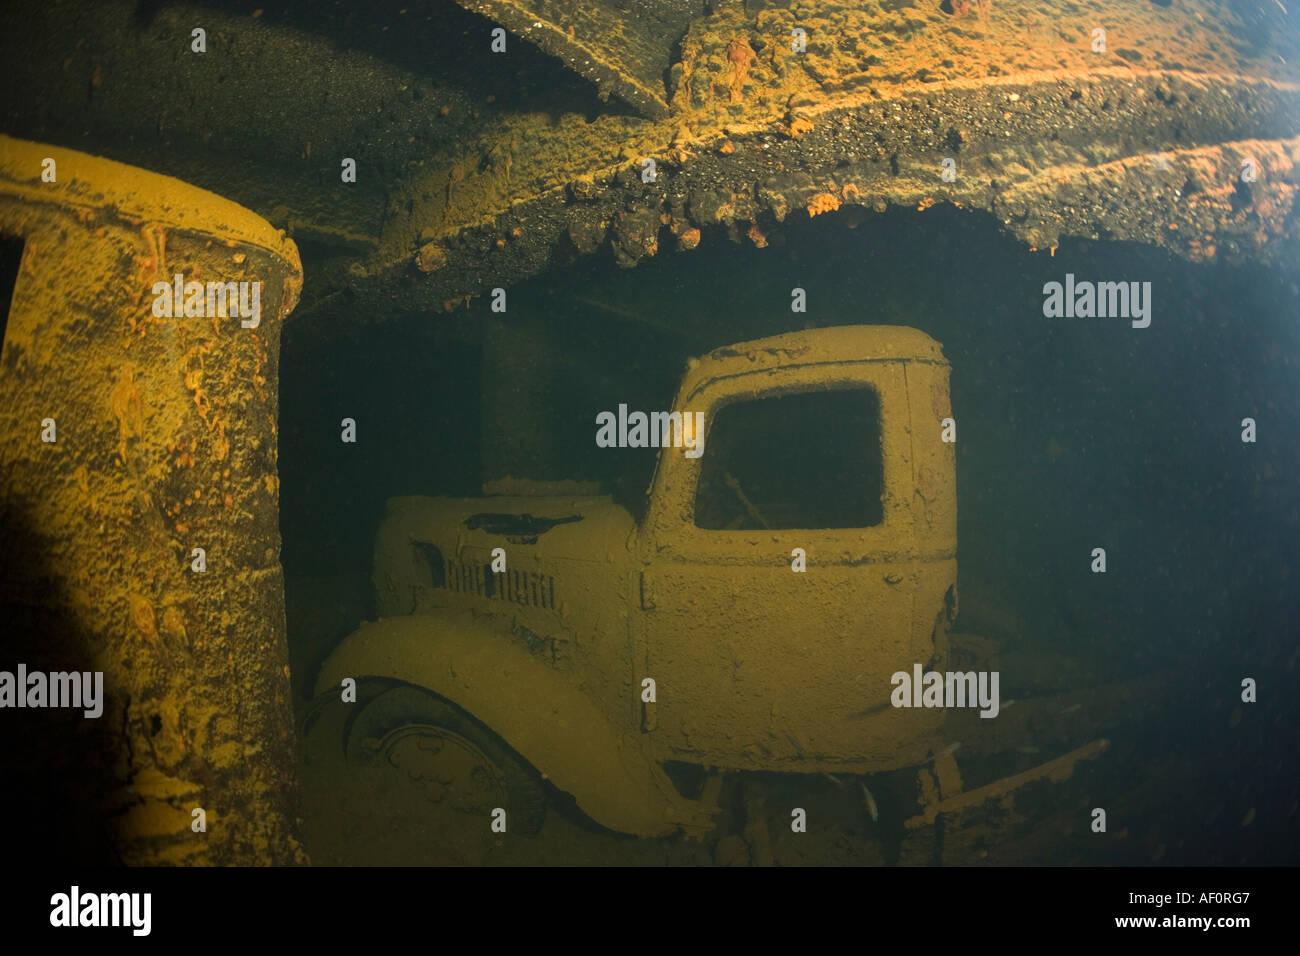 Truck in cargo hold of sunken ship hoki maru truk lagoon chuuk federated states of micronesia